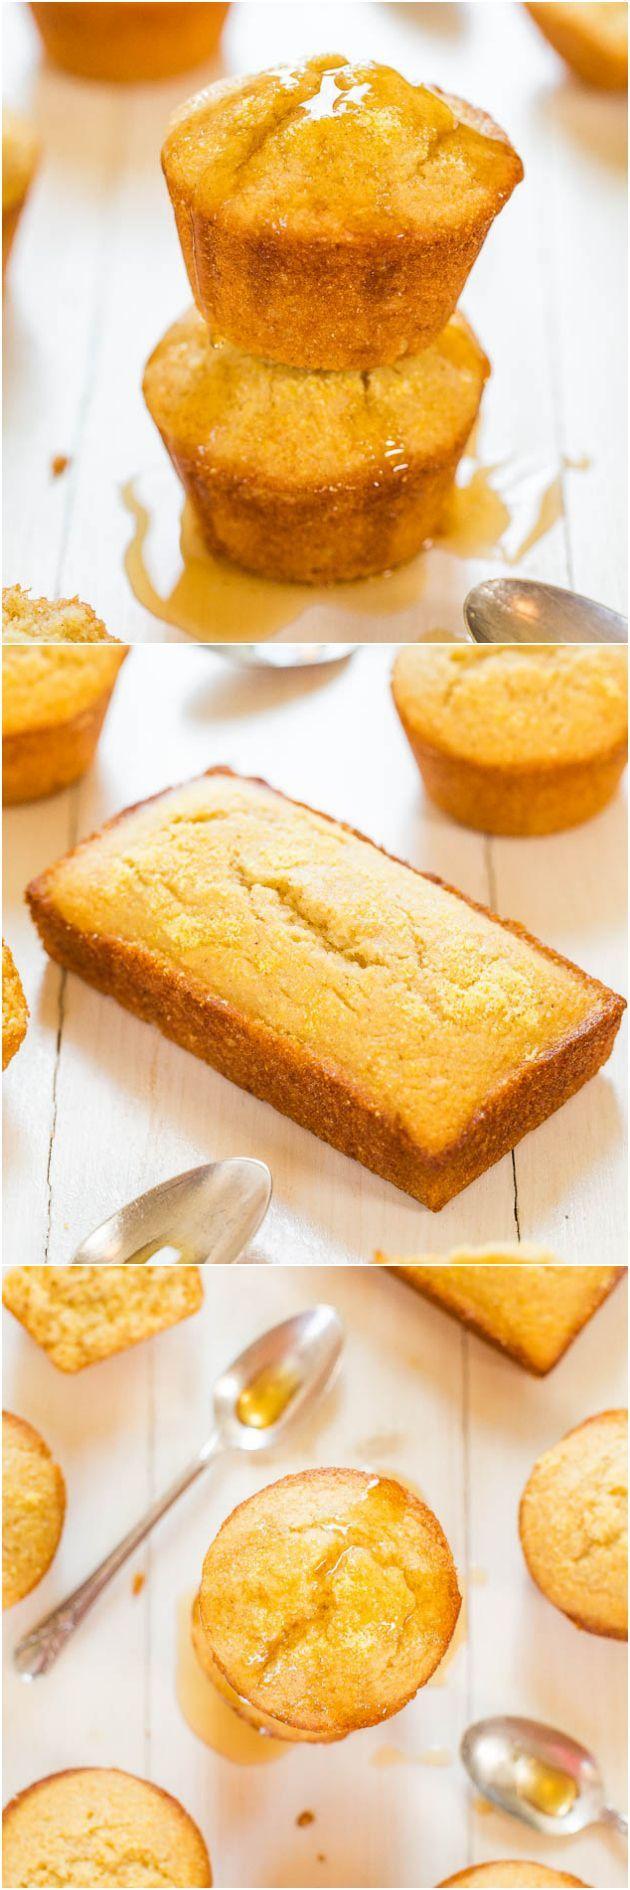 Honey Cornbread Muffins - Finally cornbread that's not dry! Fluffy ...